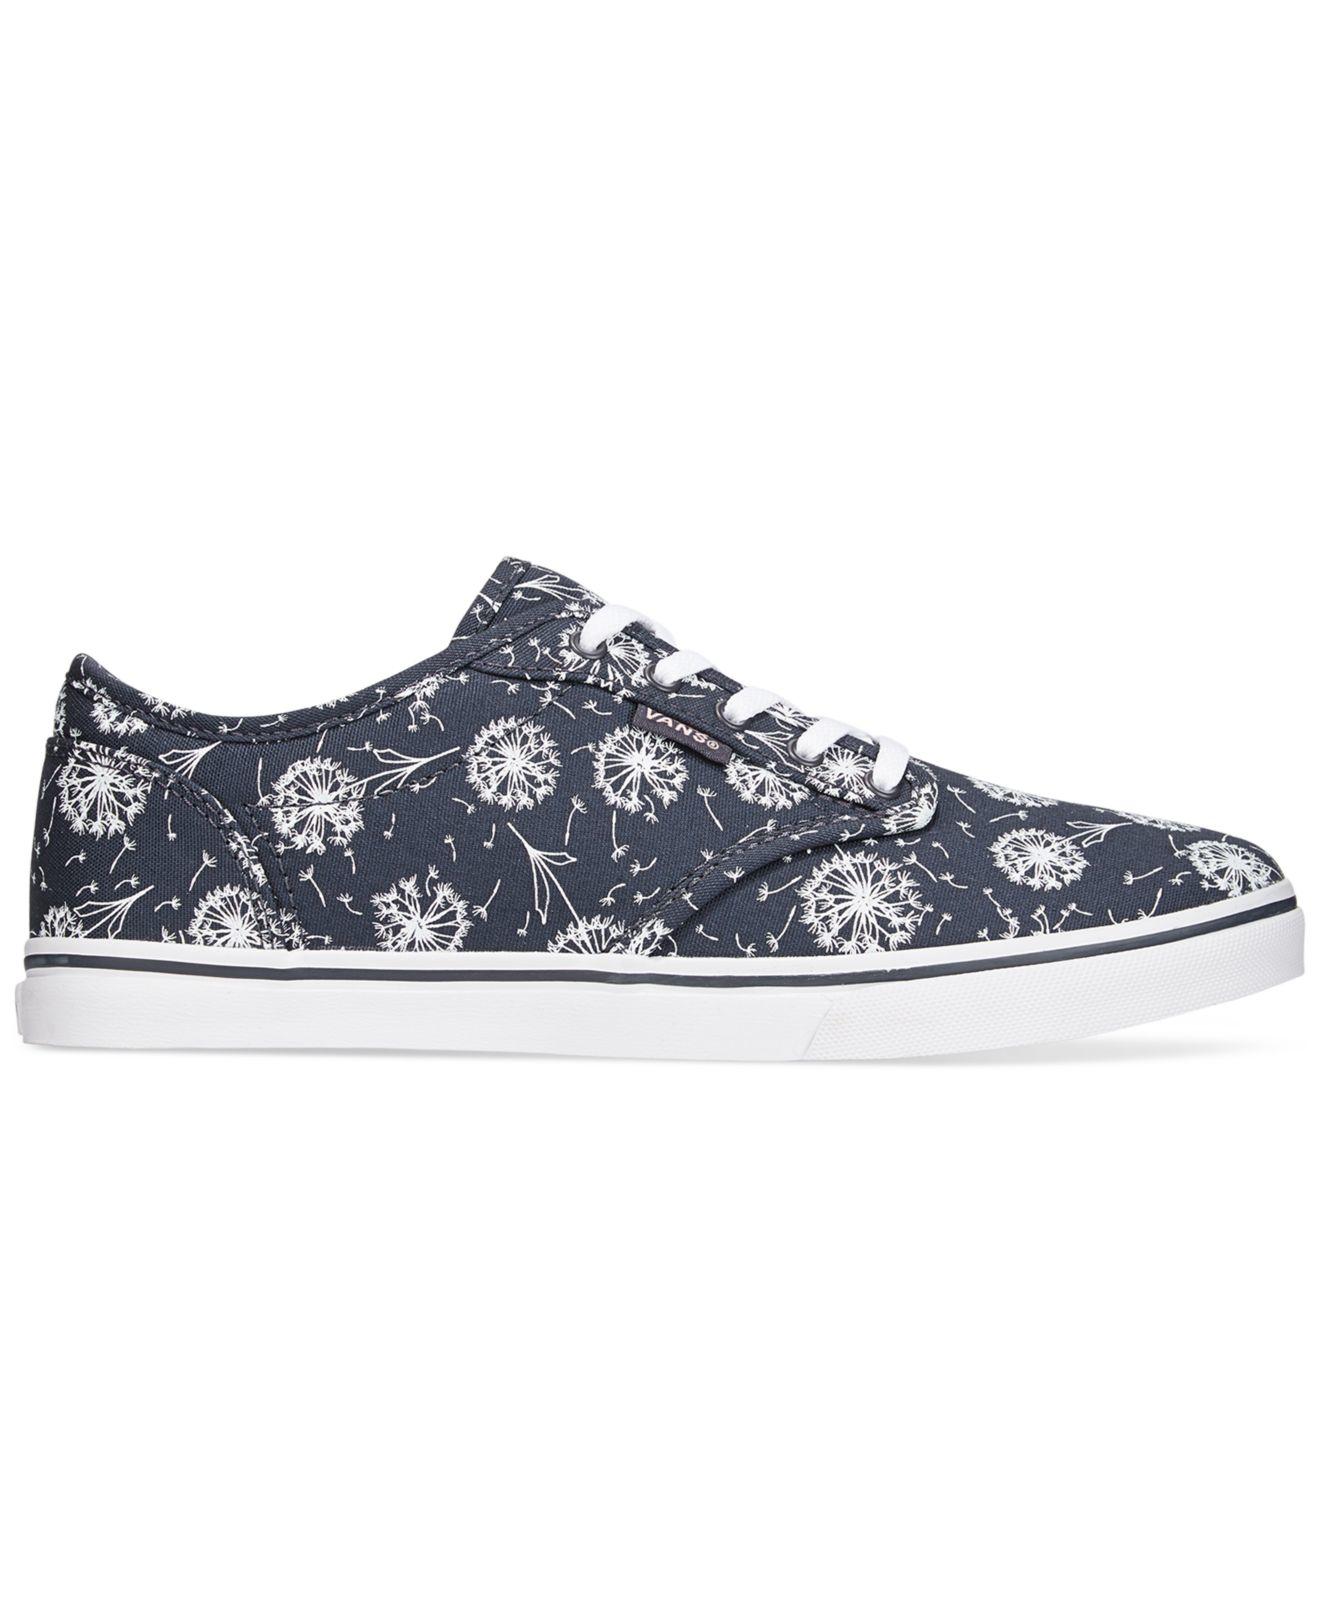 Lyst Vans Women S Atwood Low Dandelion Lace Up Sneakers